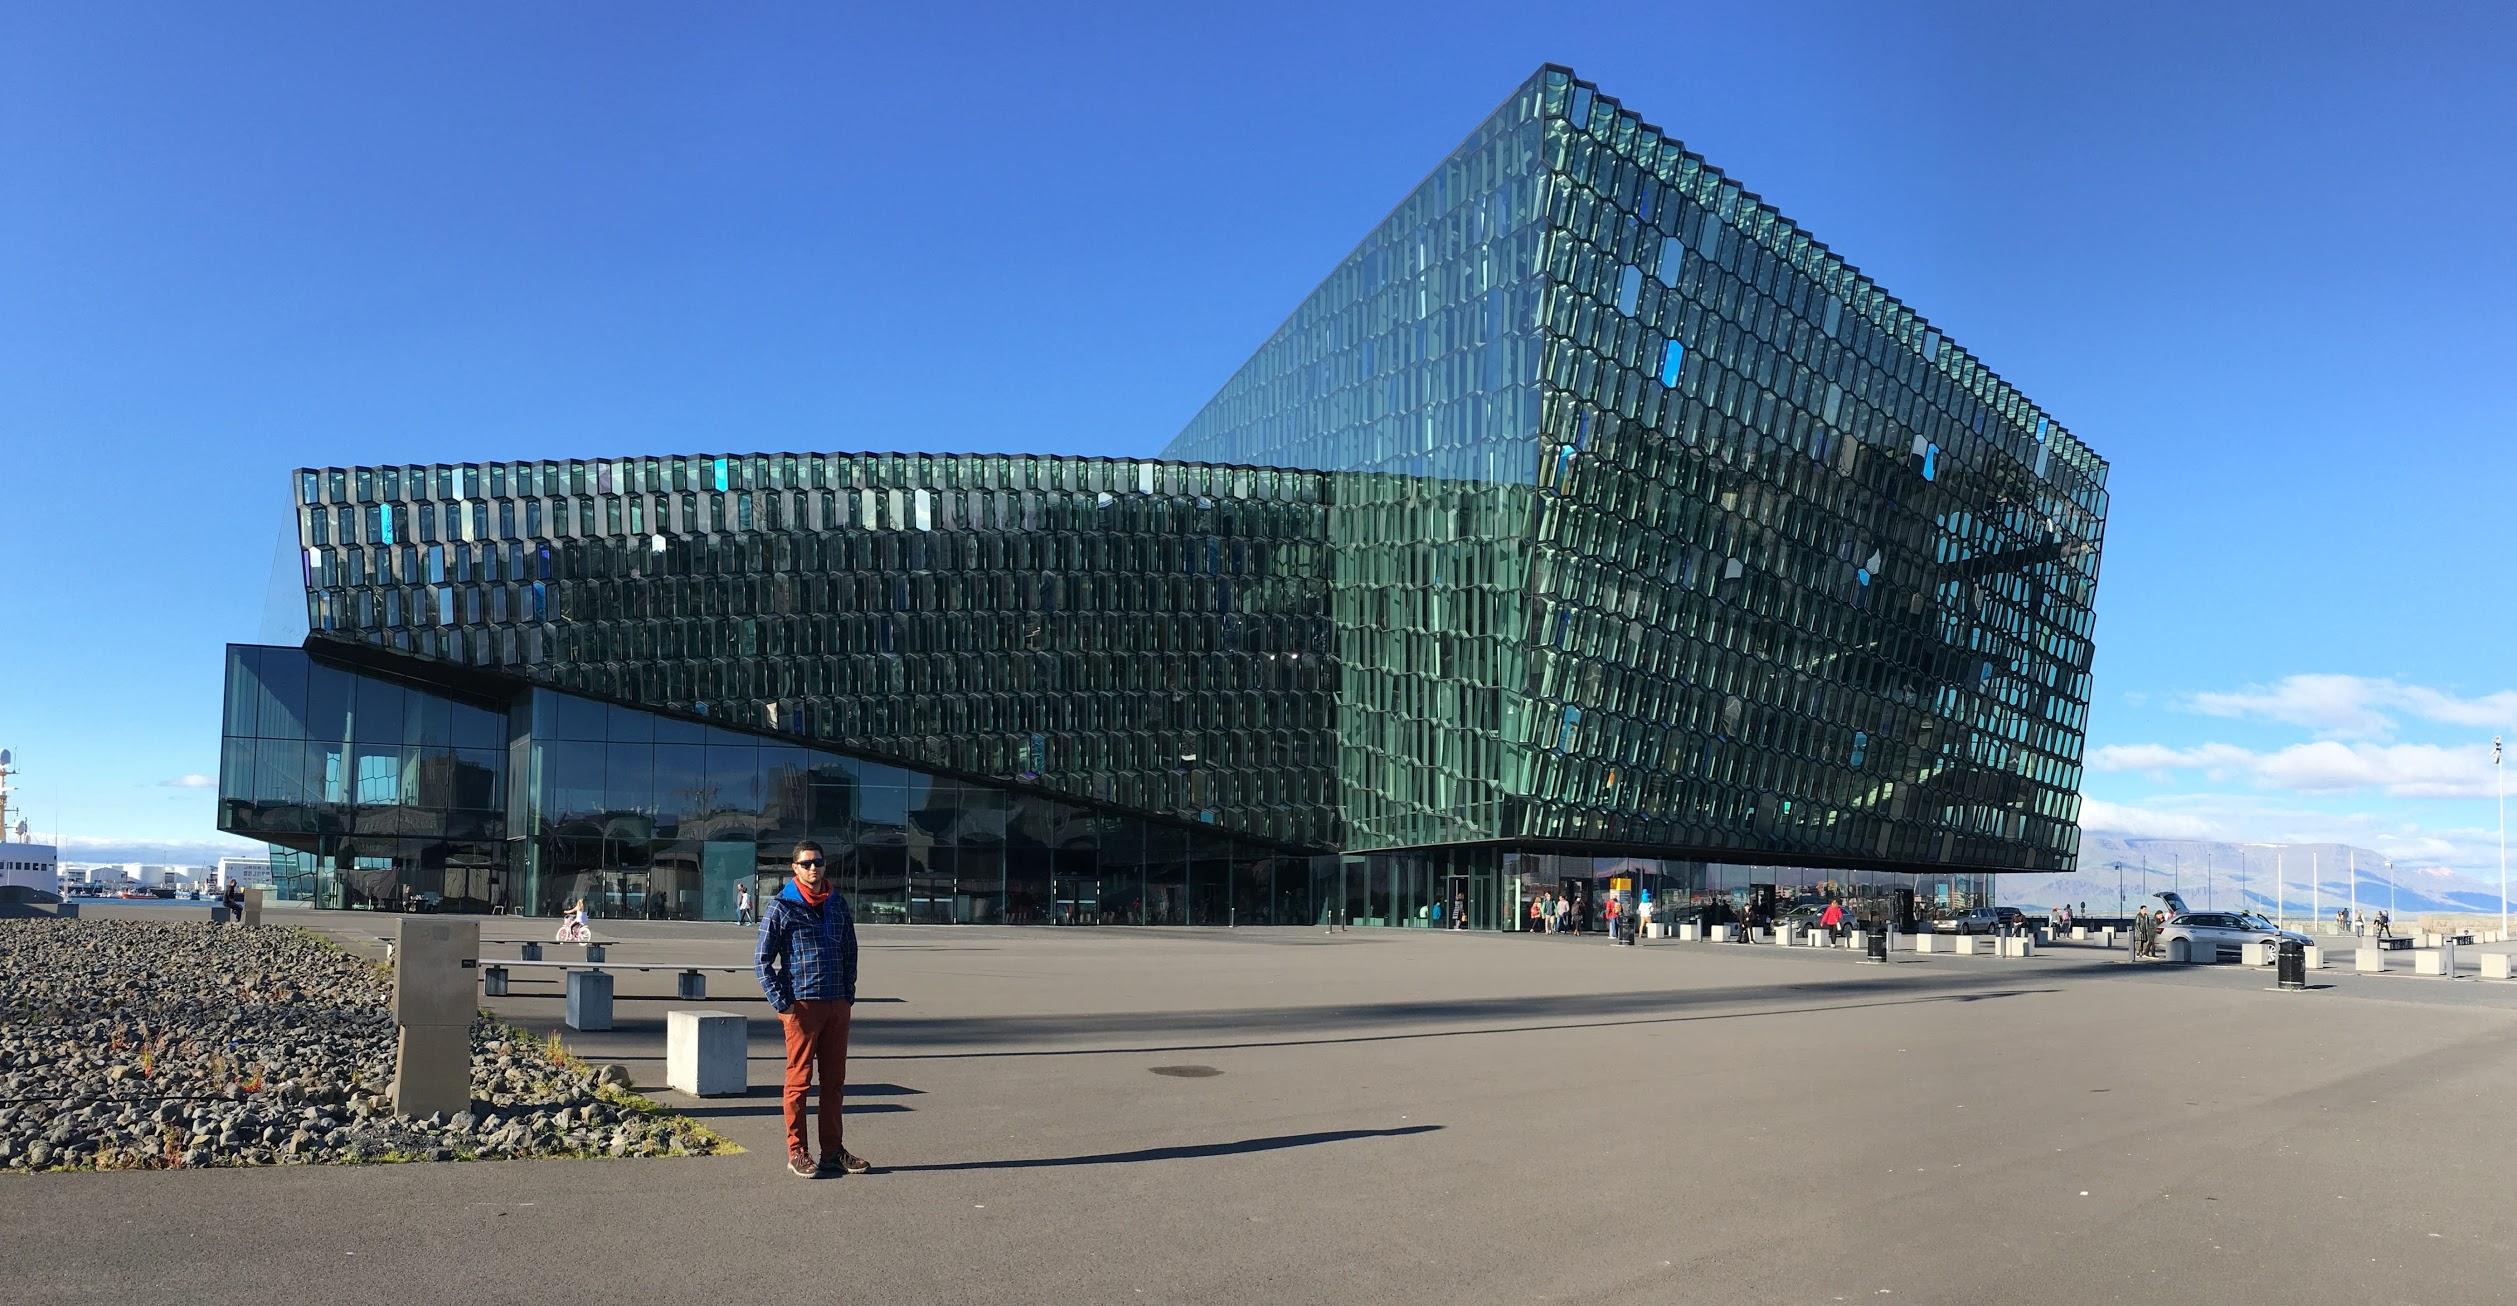 jermpins iceland harpa concert hall